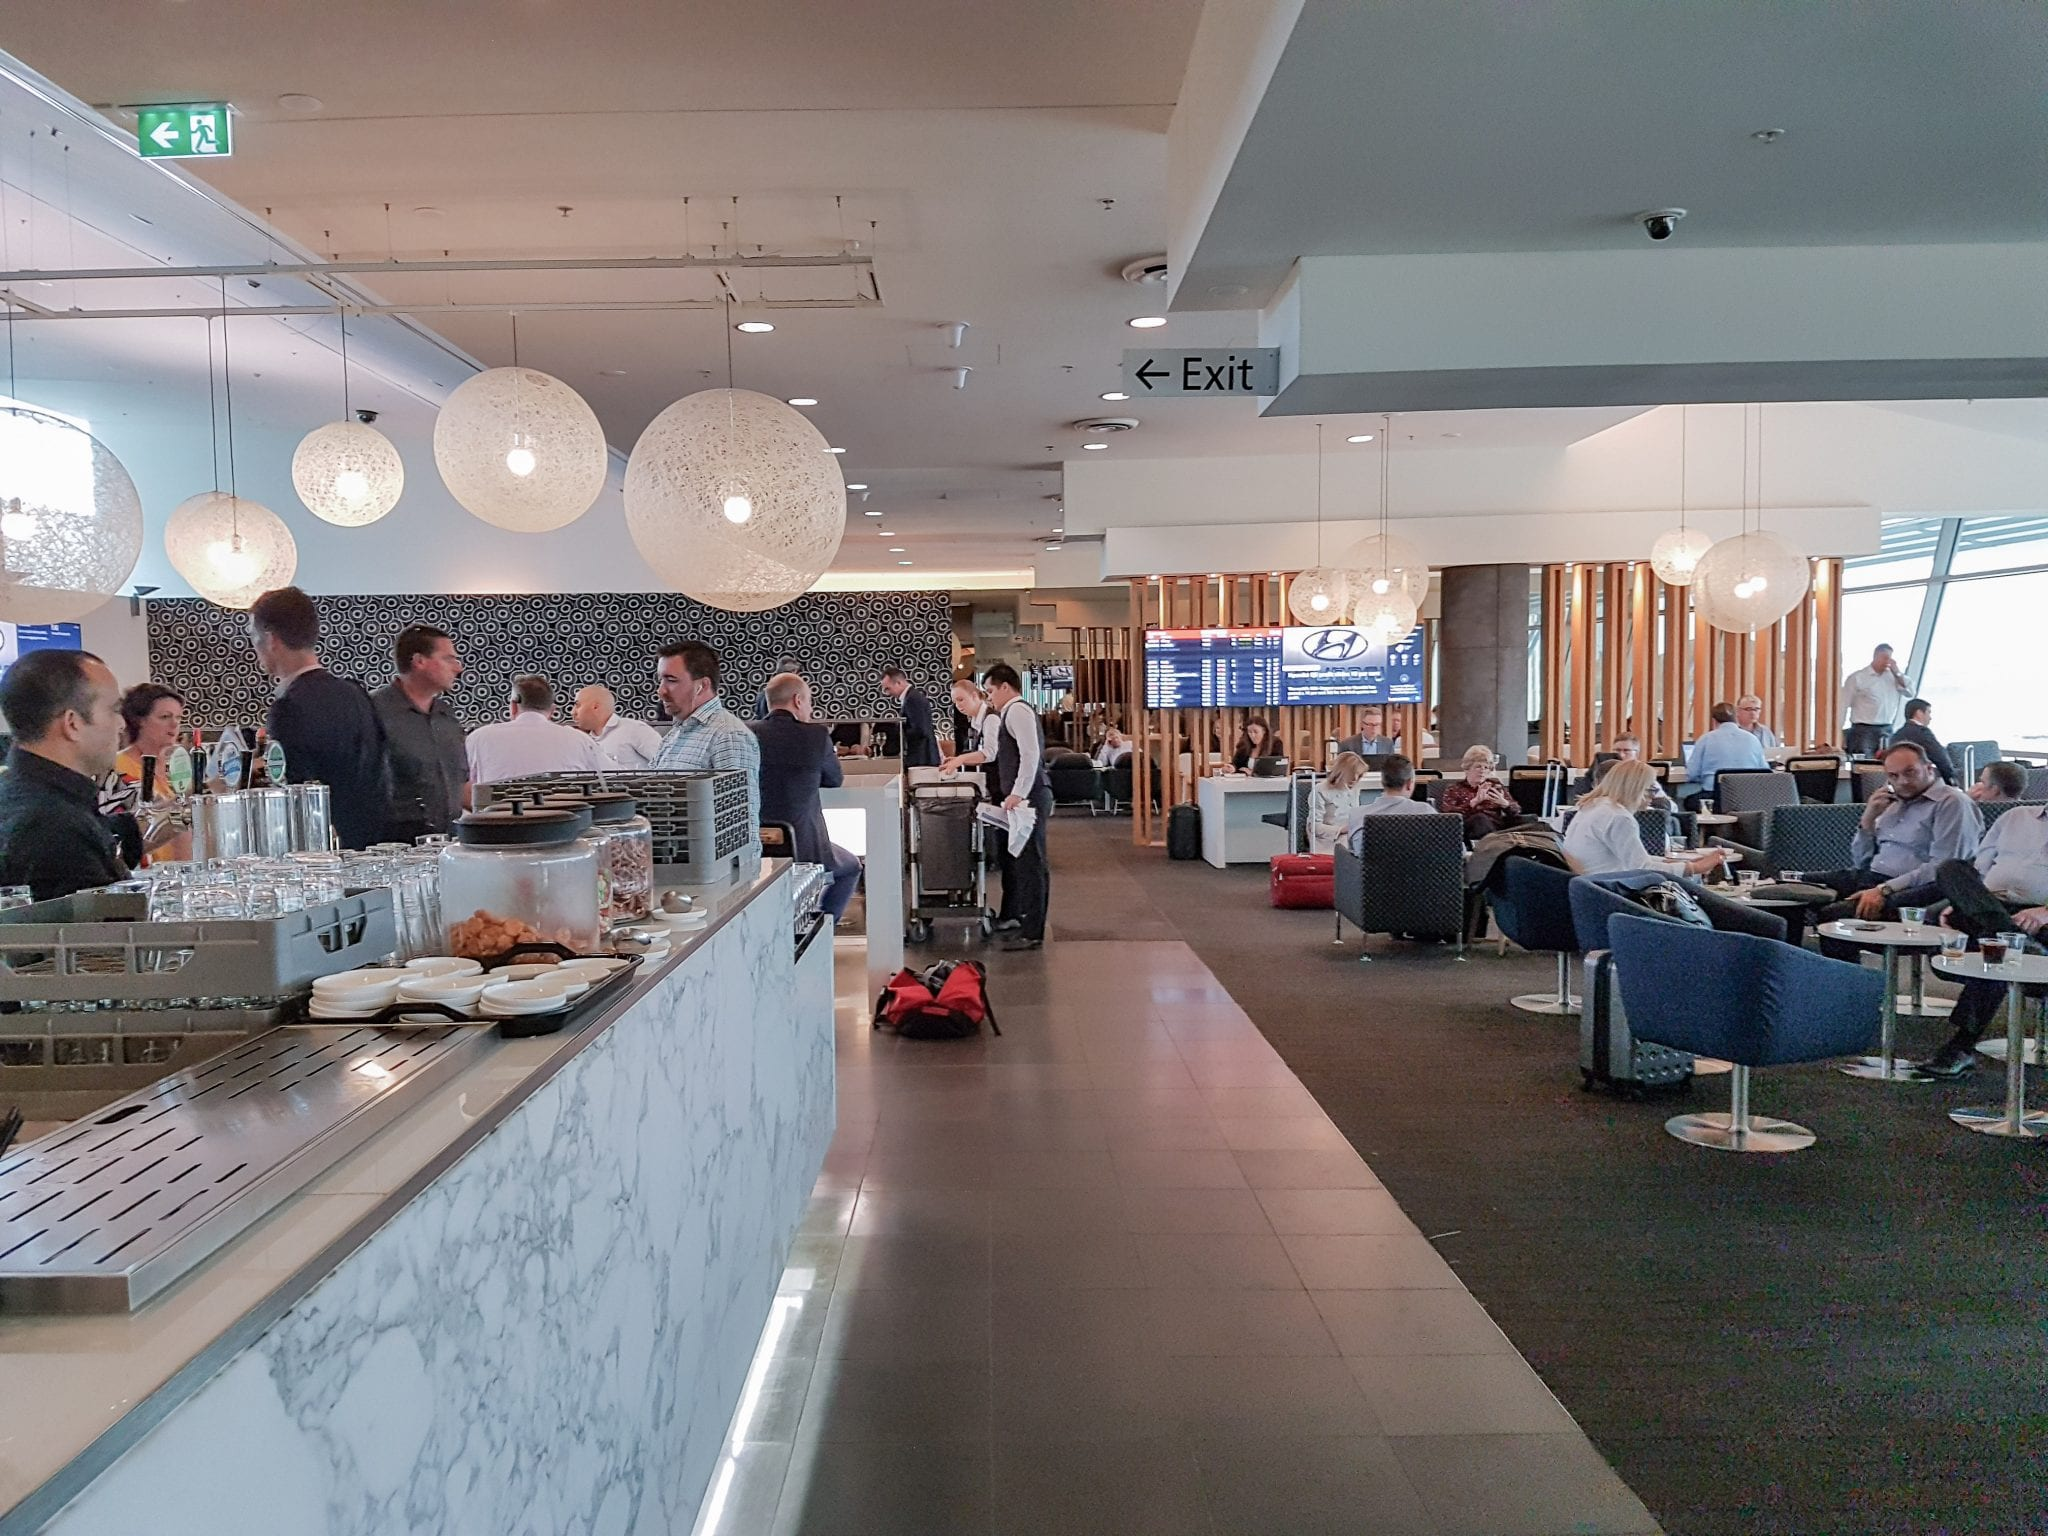 qantas lounge sydney